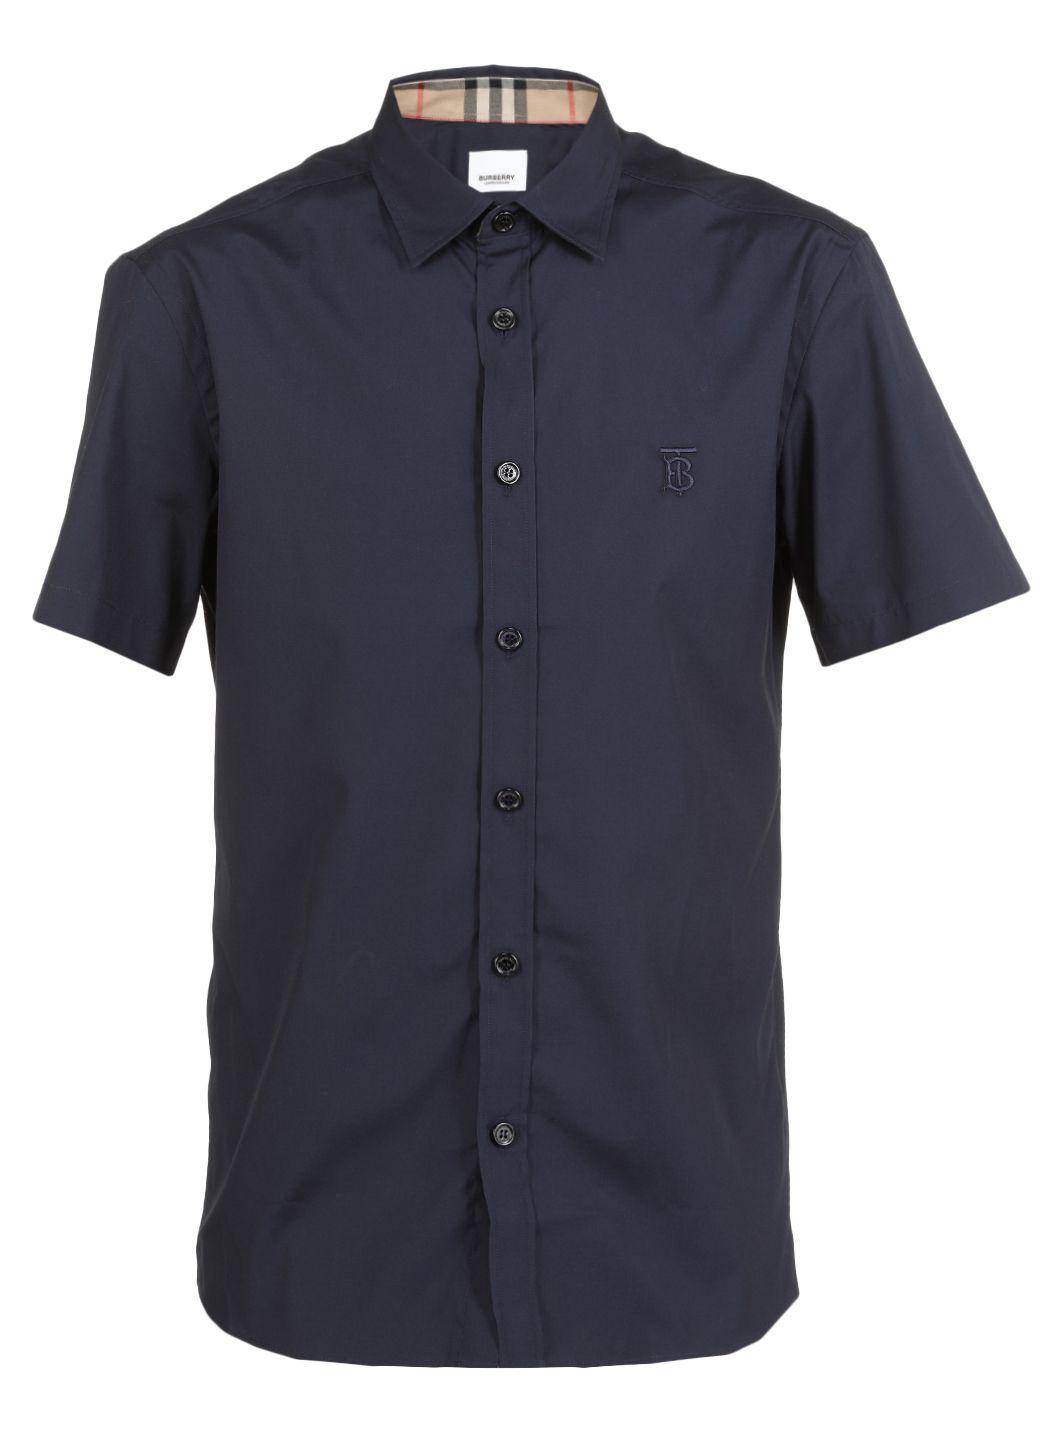 Popline cotton shirt